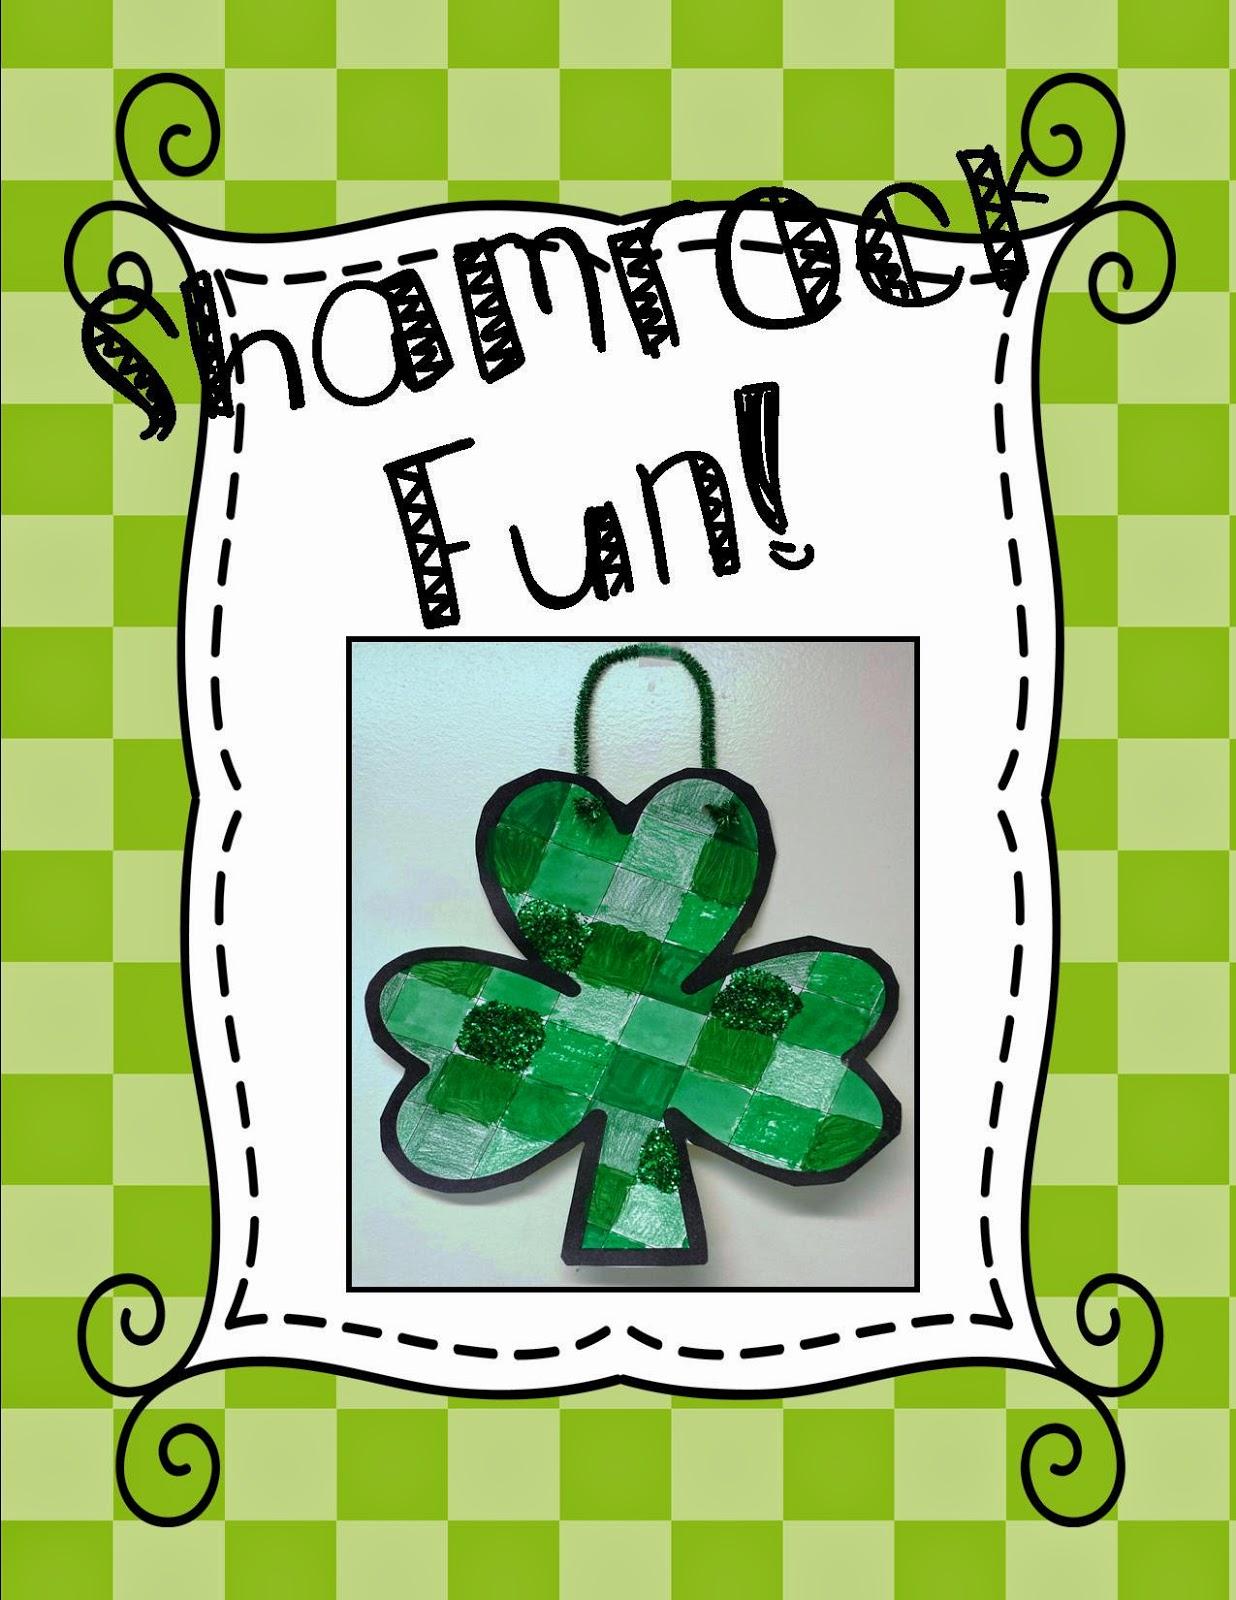 https://www.teacherspayteachers.com/Product/Shamrock-Fun-Perfect-for-St-Patricks-day-Easy-Art-Project-FREEBIE-1736471